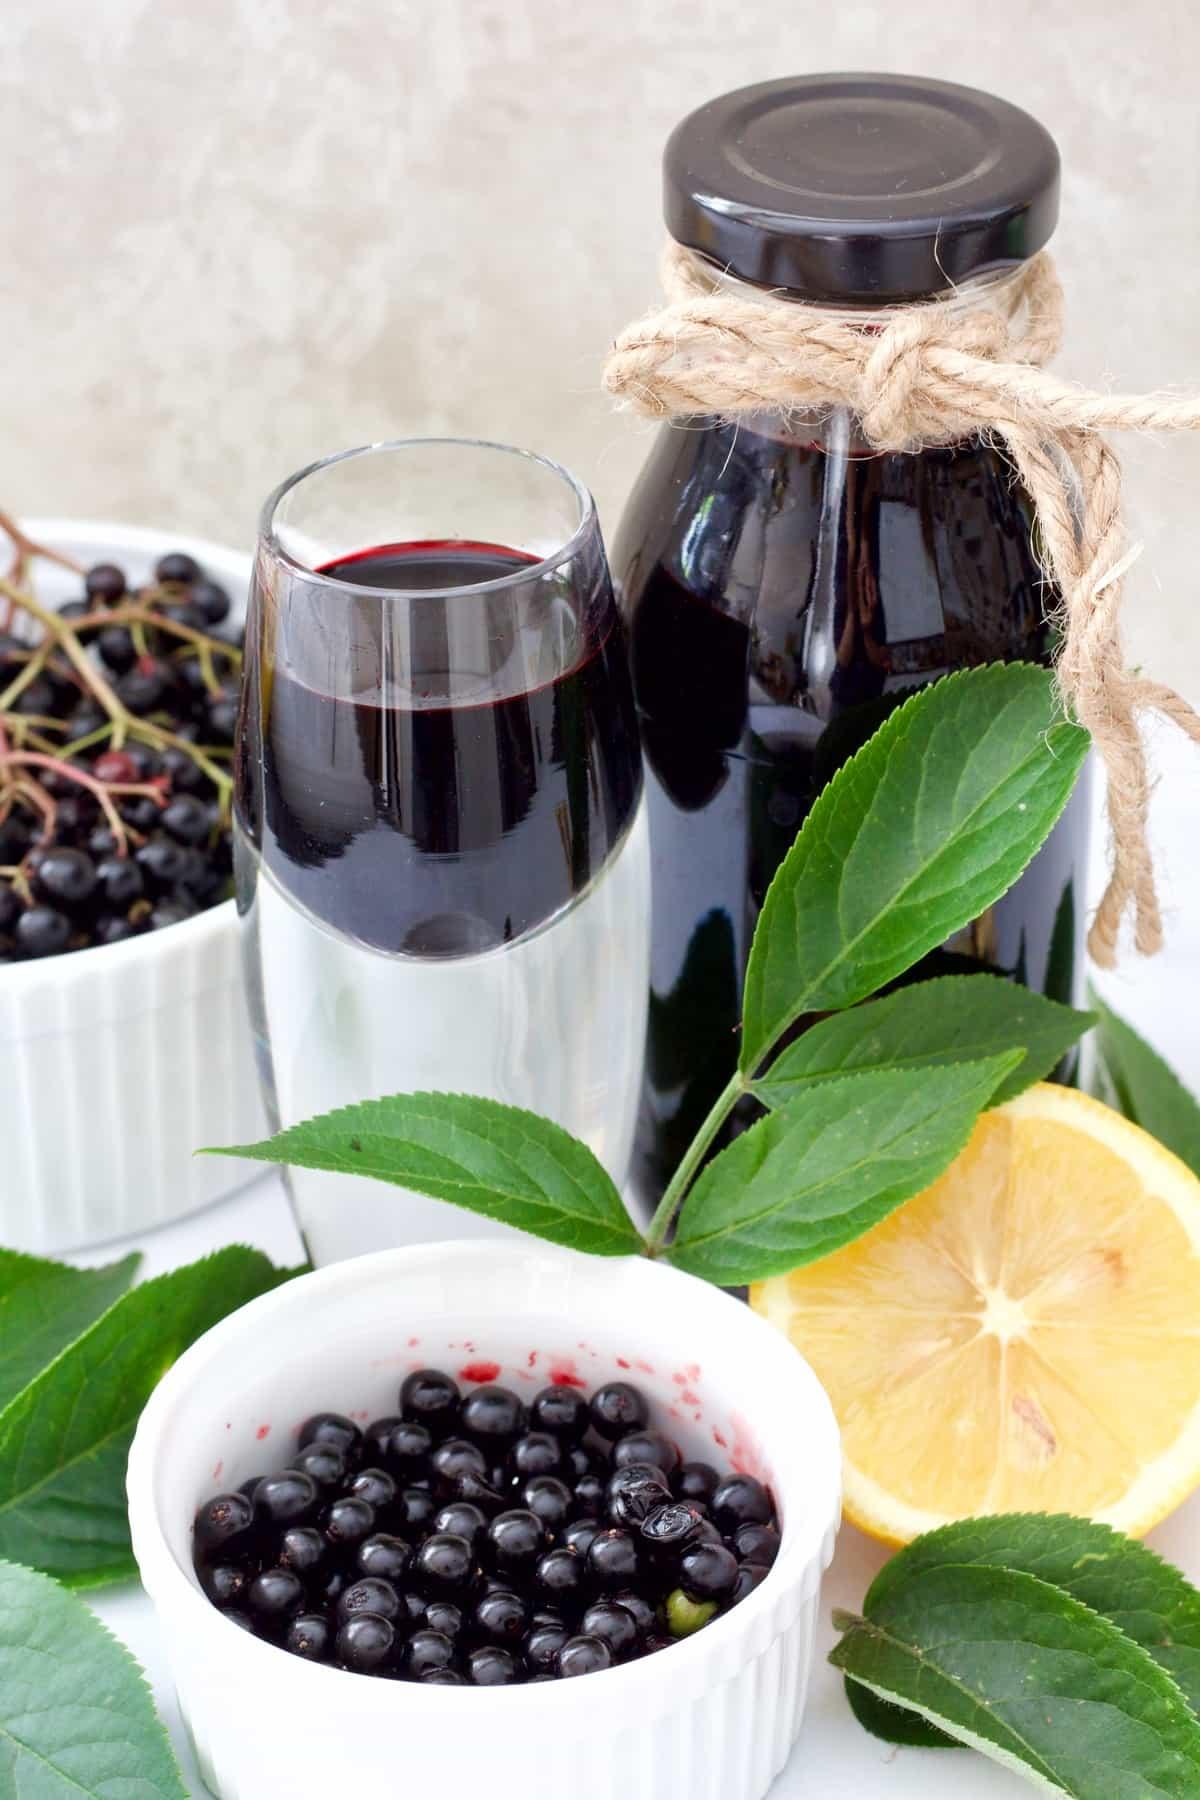 Small bottle & shot glass w with elderberry syrup, fresh elderberries.